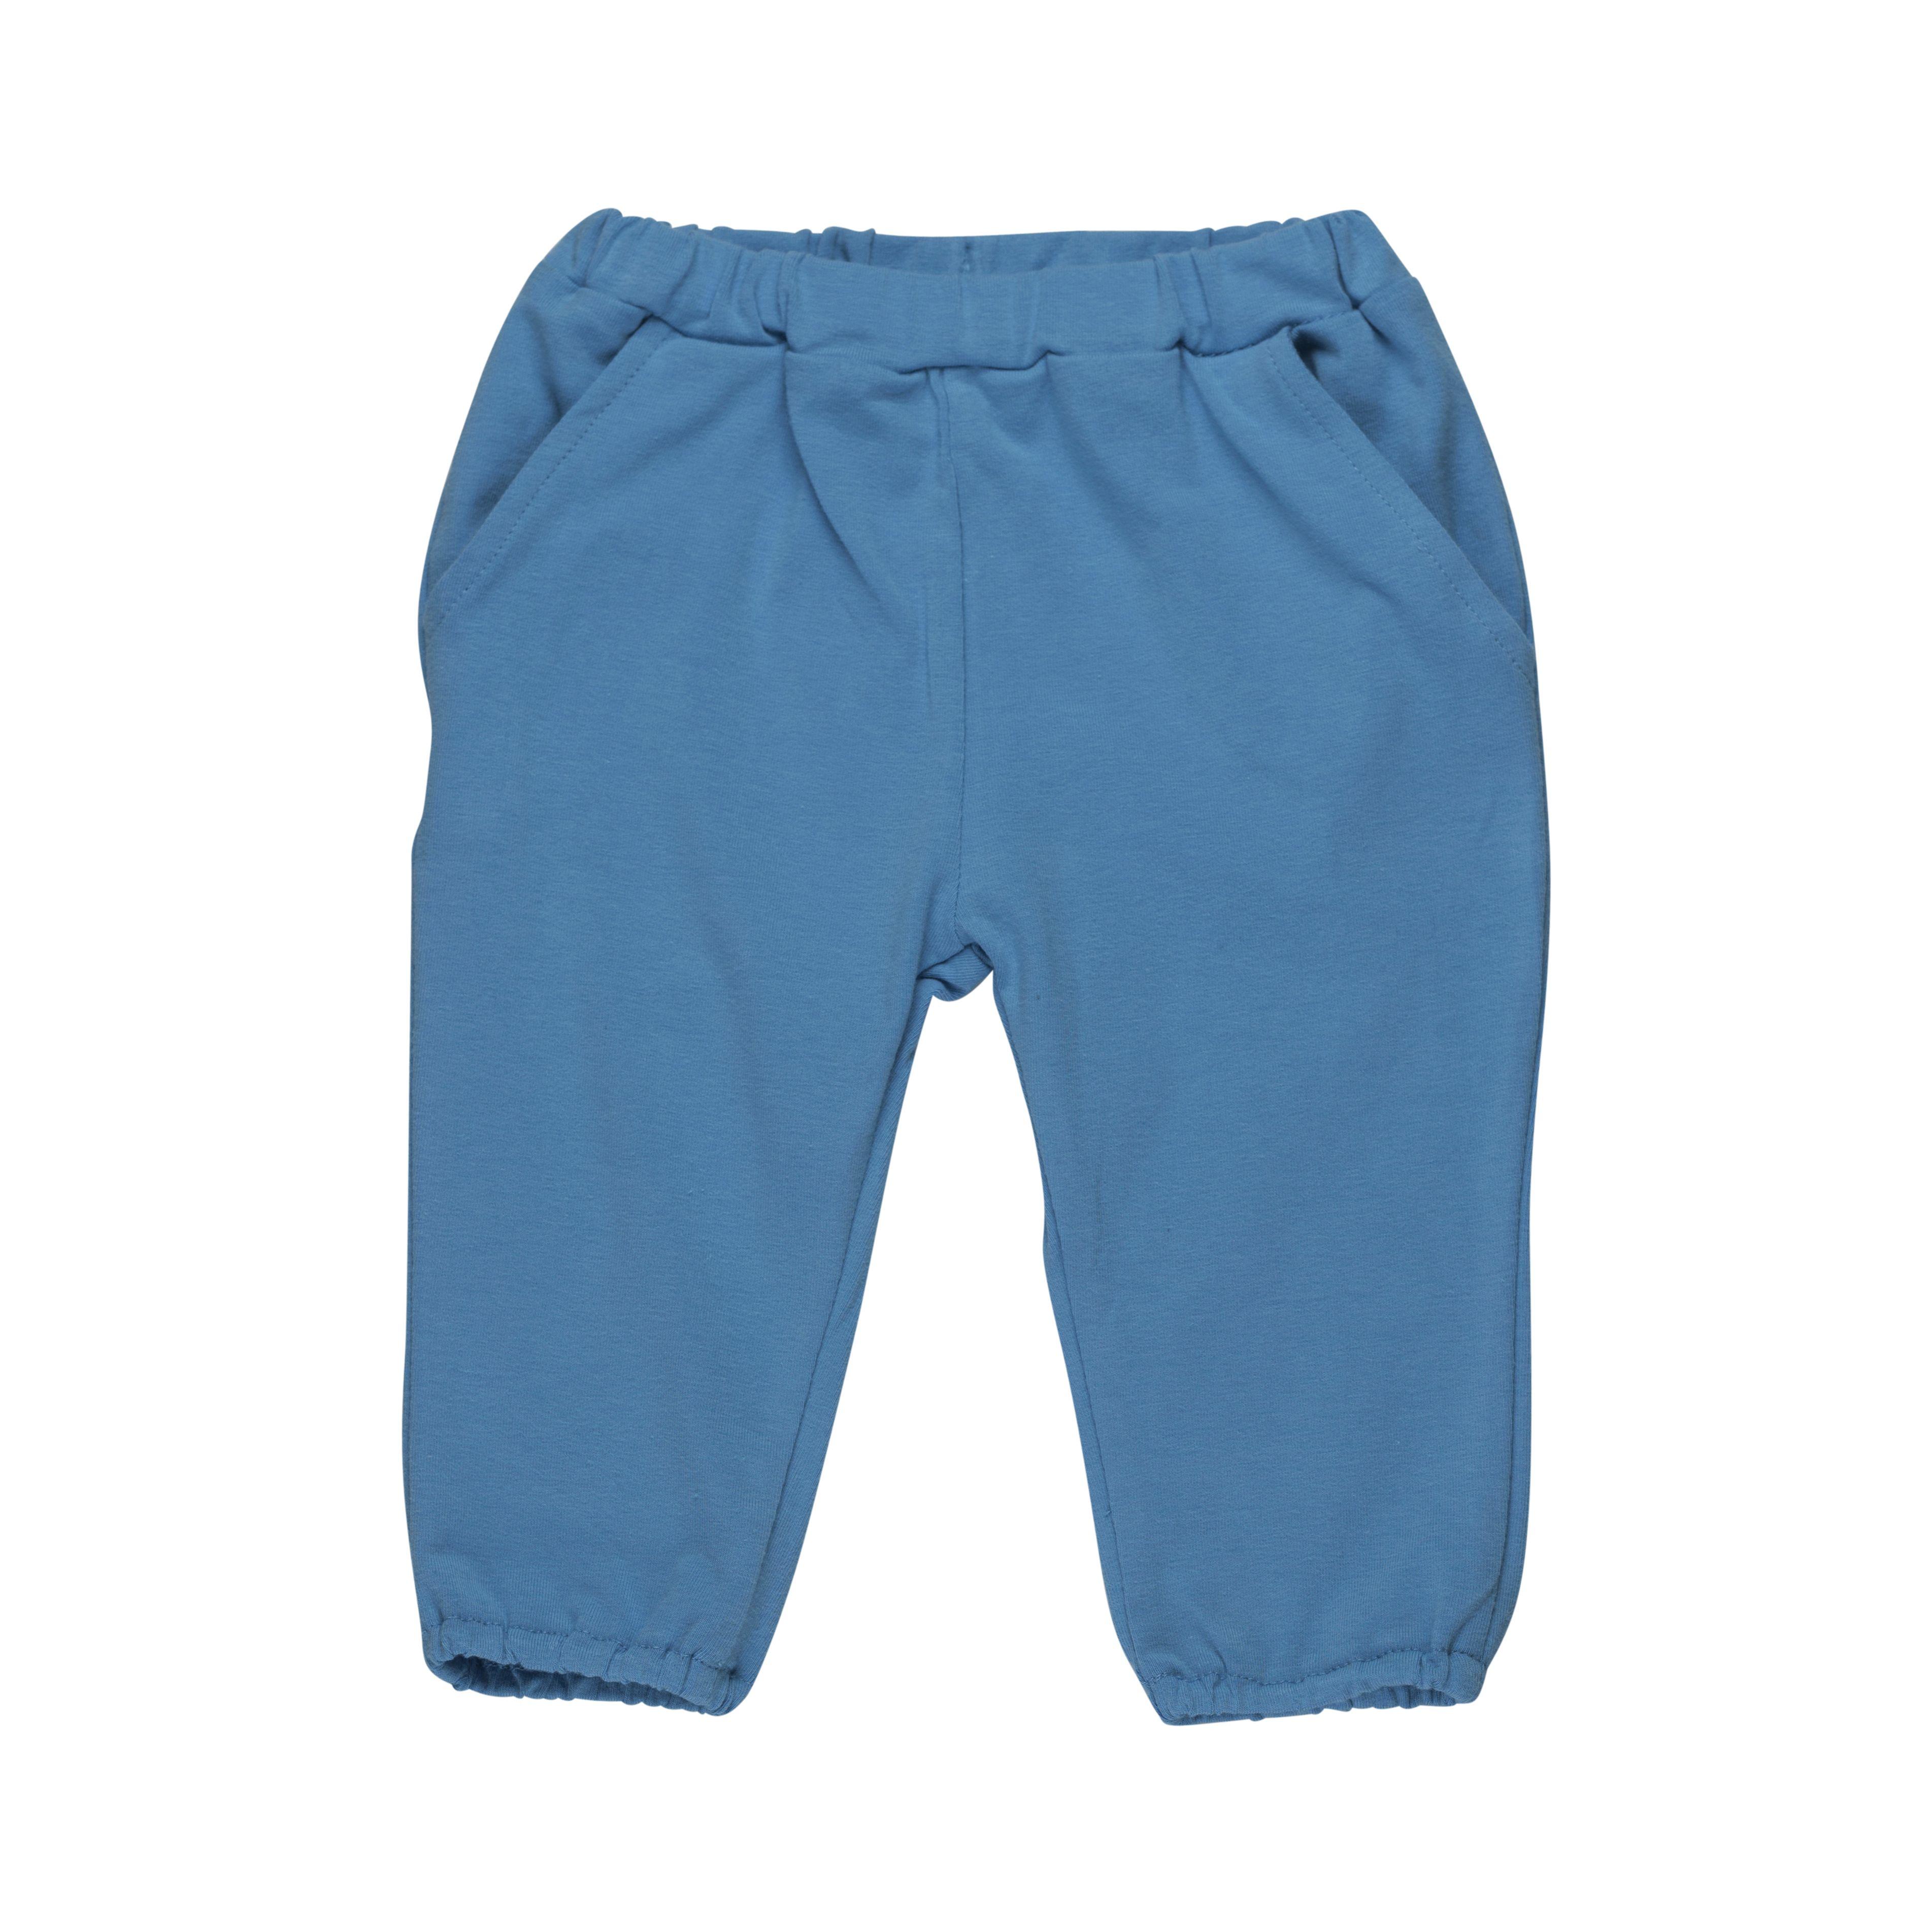 Image of Baby bukser fra Pippi - Økologisk Bomuld - Sky Blue (4019-720)